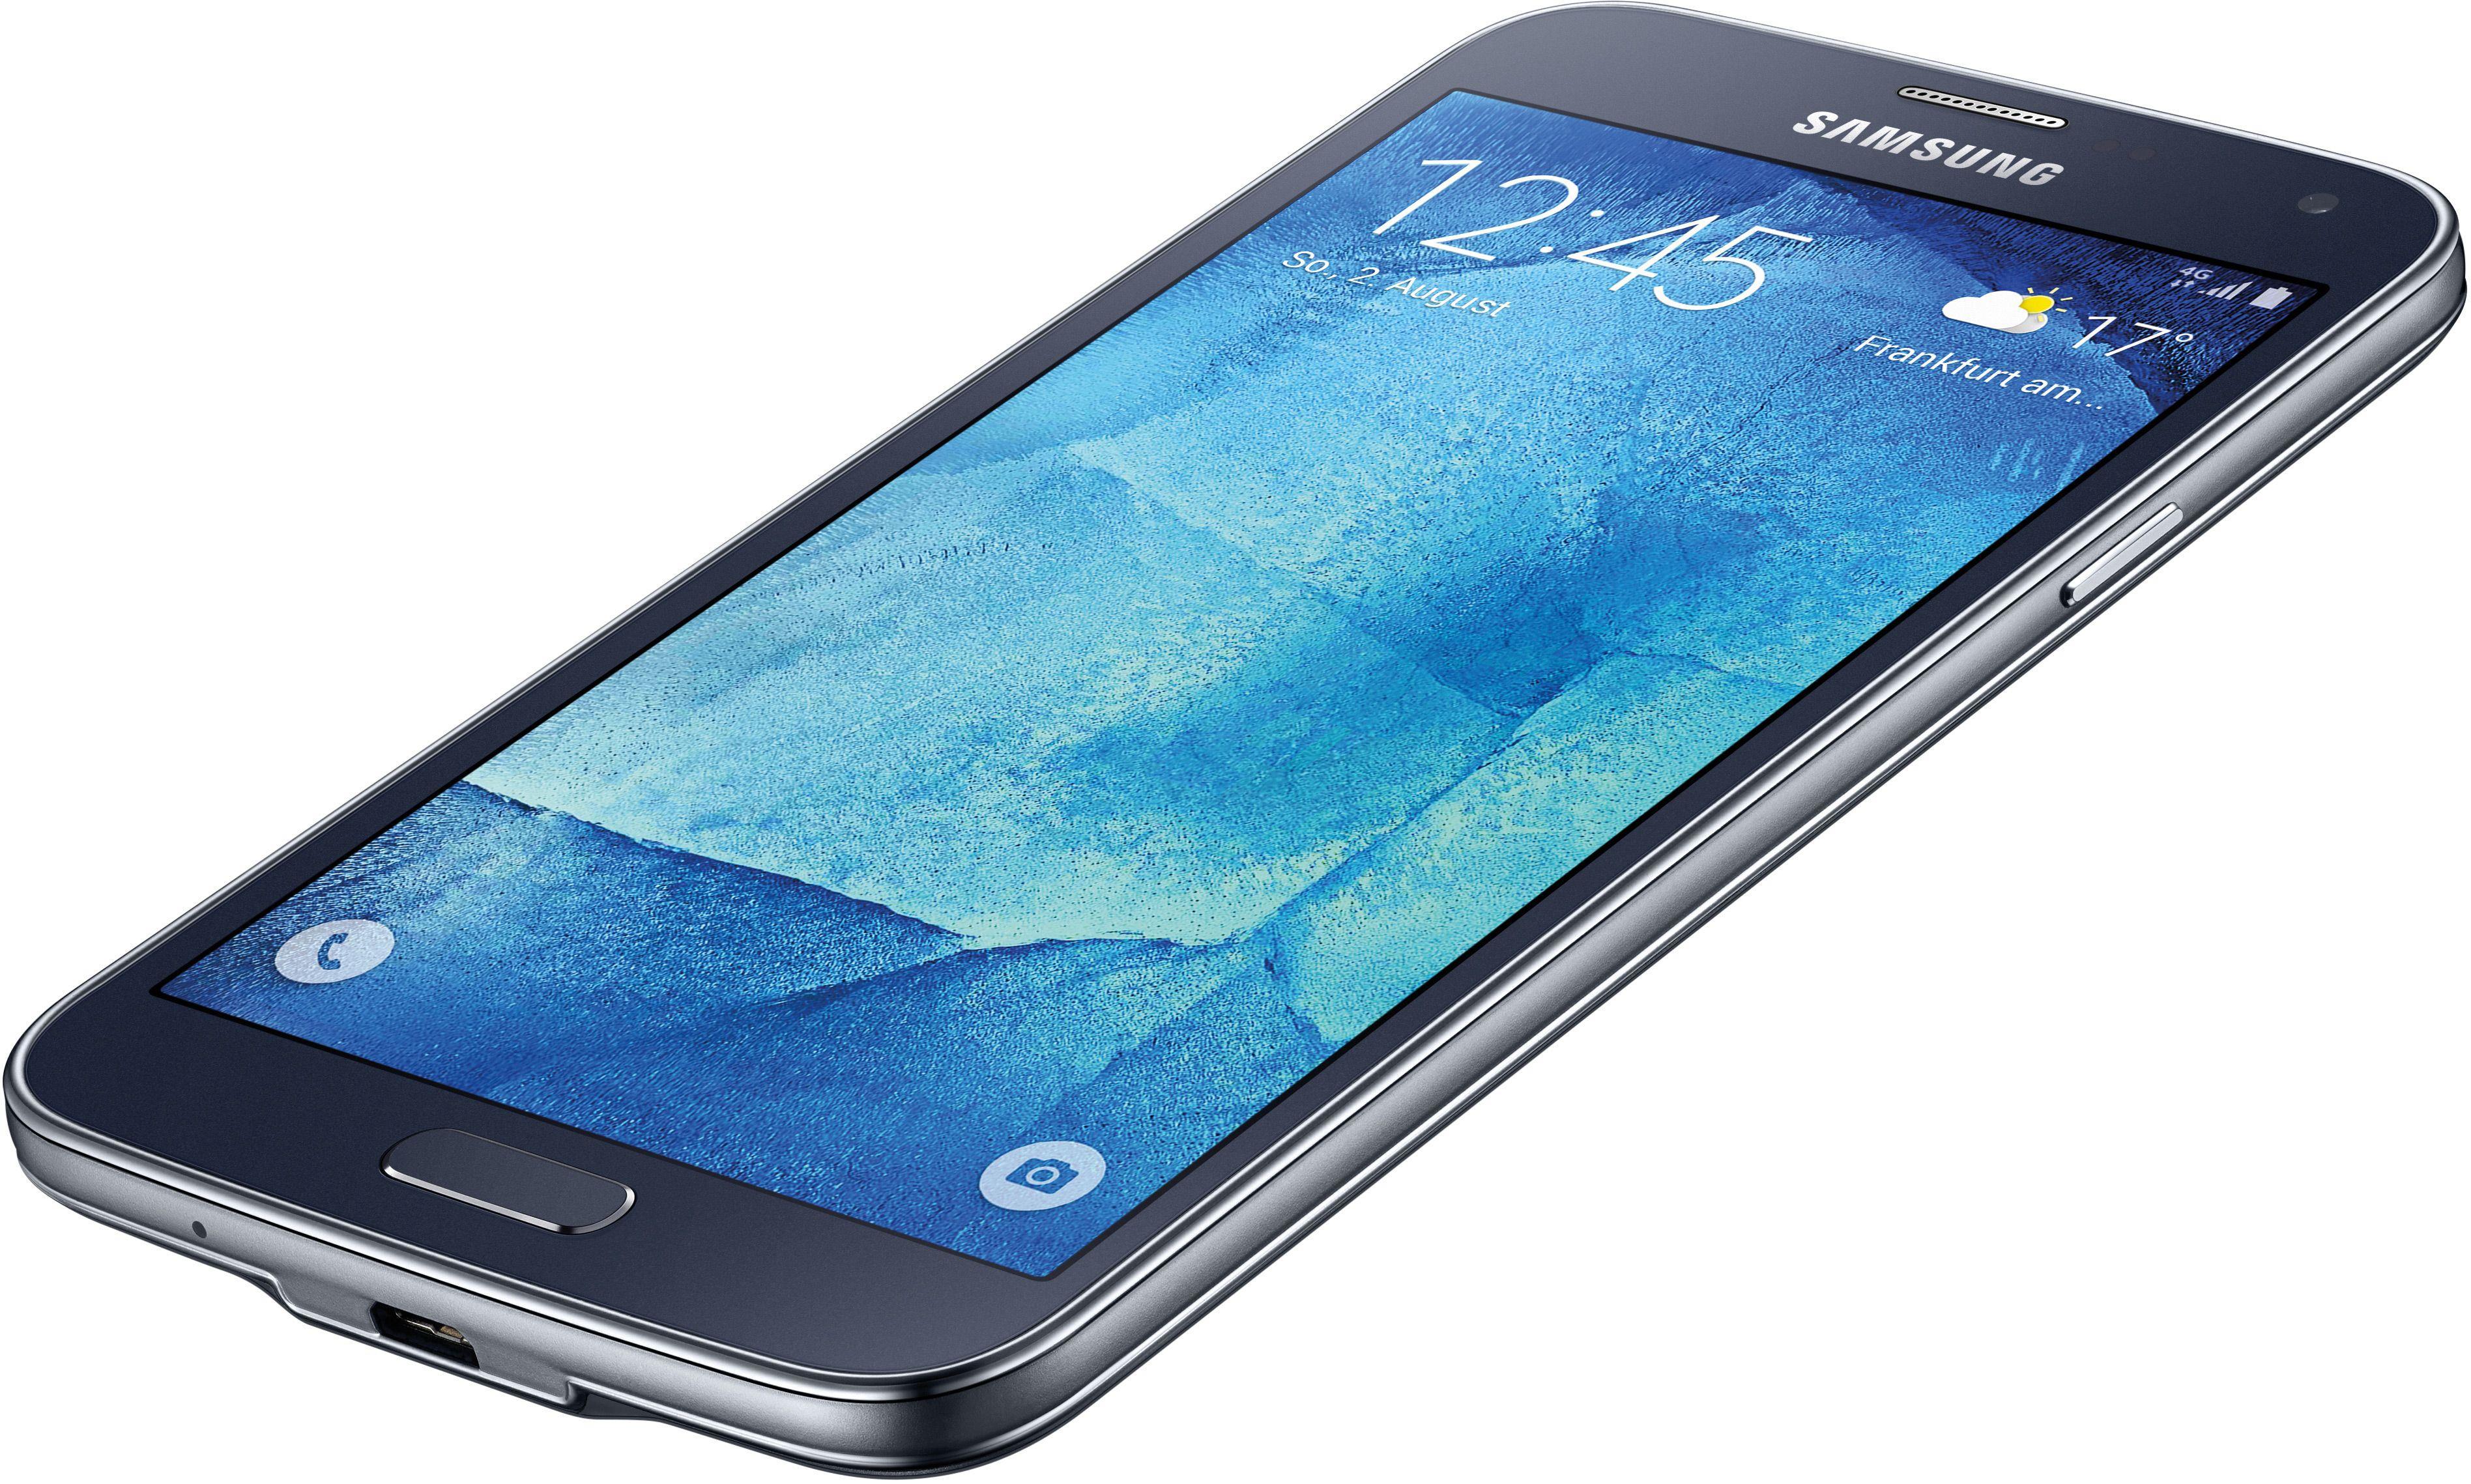 Samsung Galaxy S5 neo Smartphone (5,1 Zoll (12,9 cm) Touch